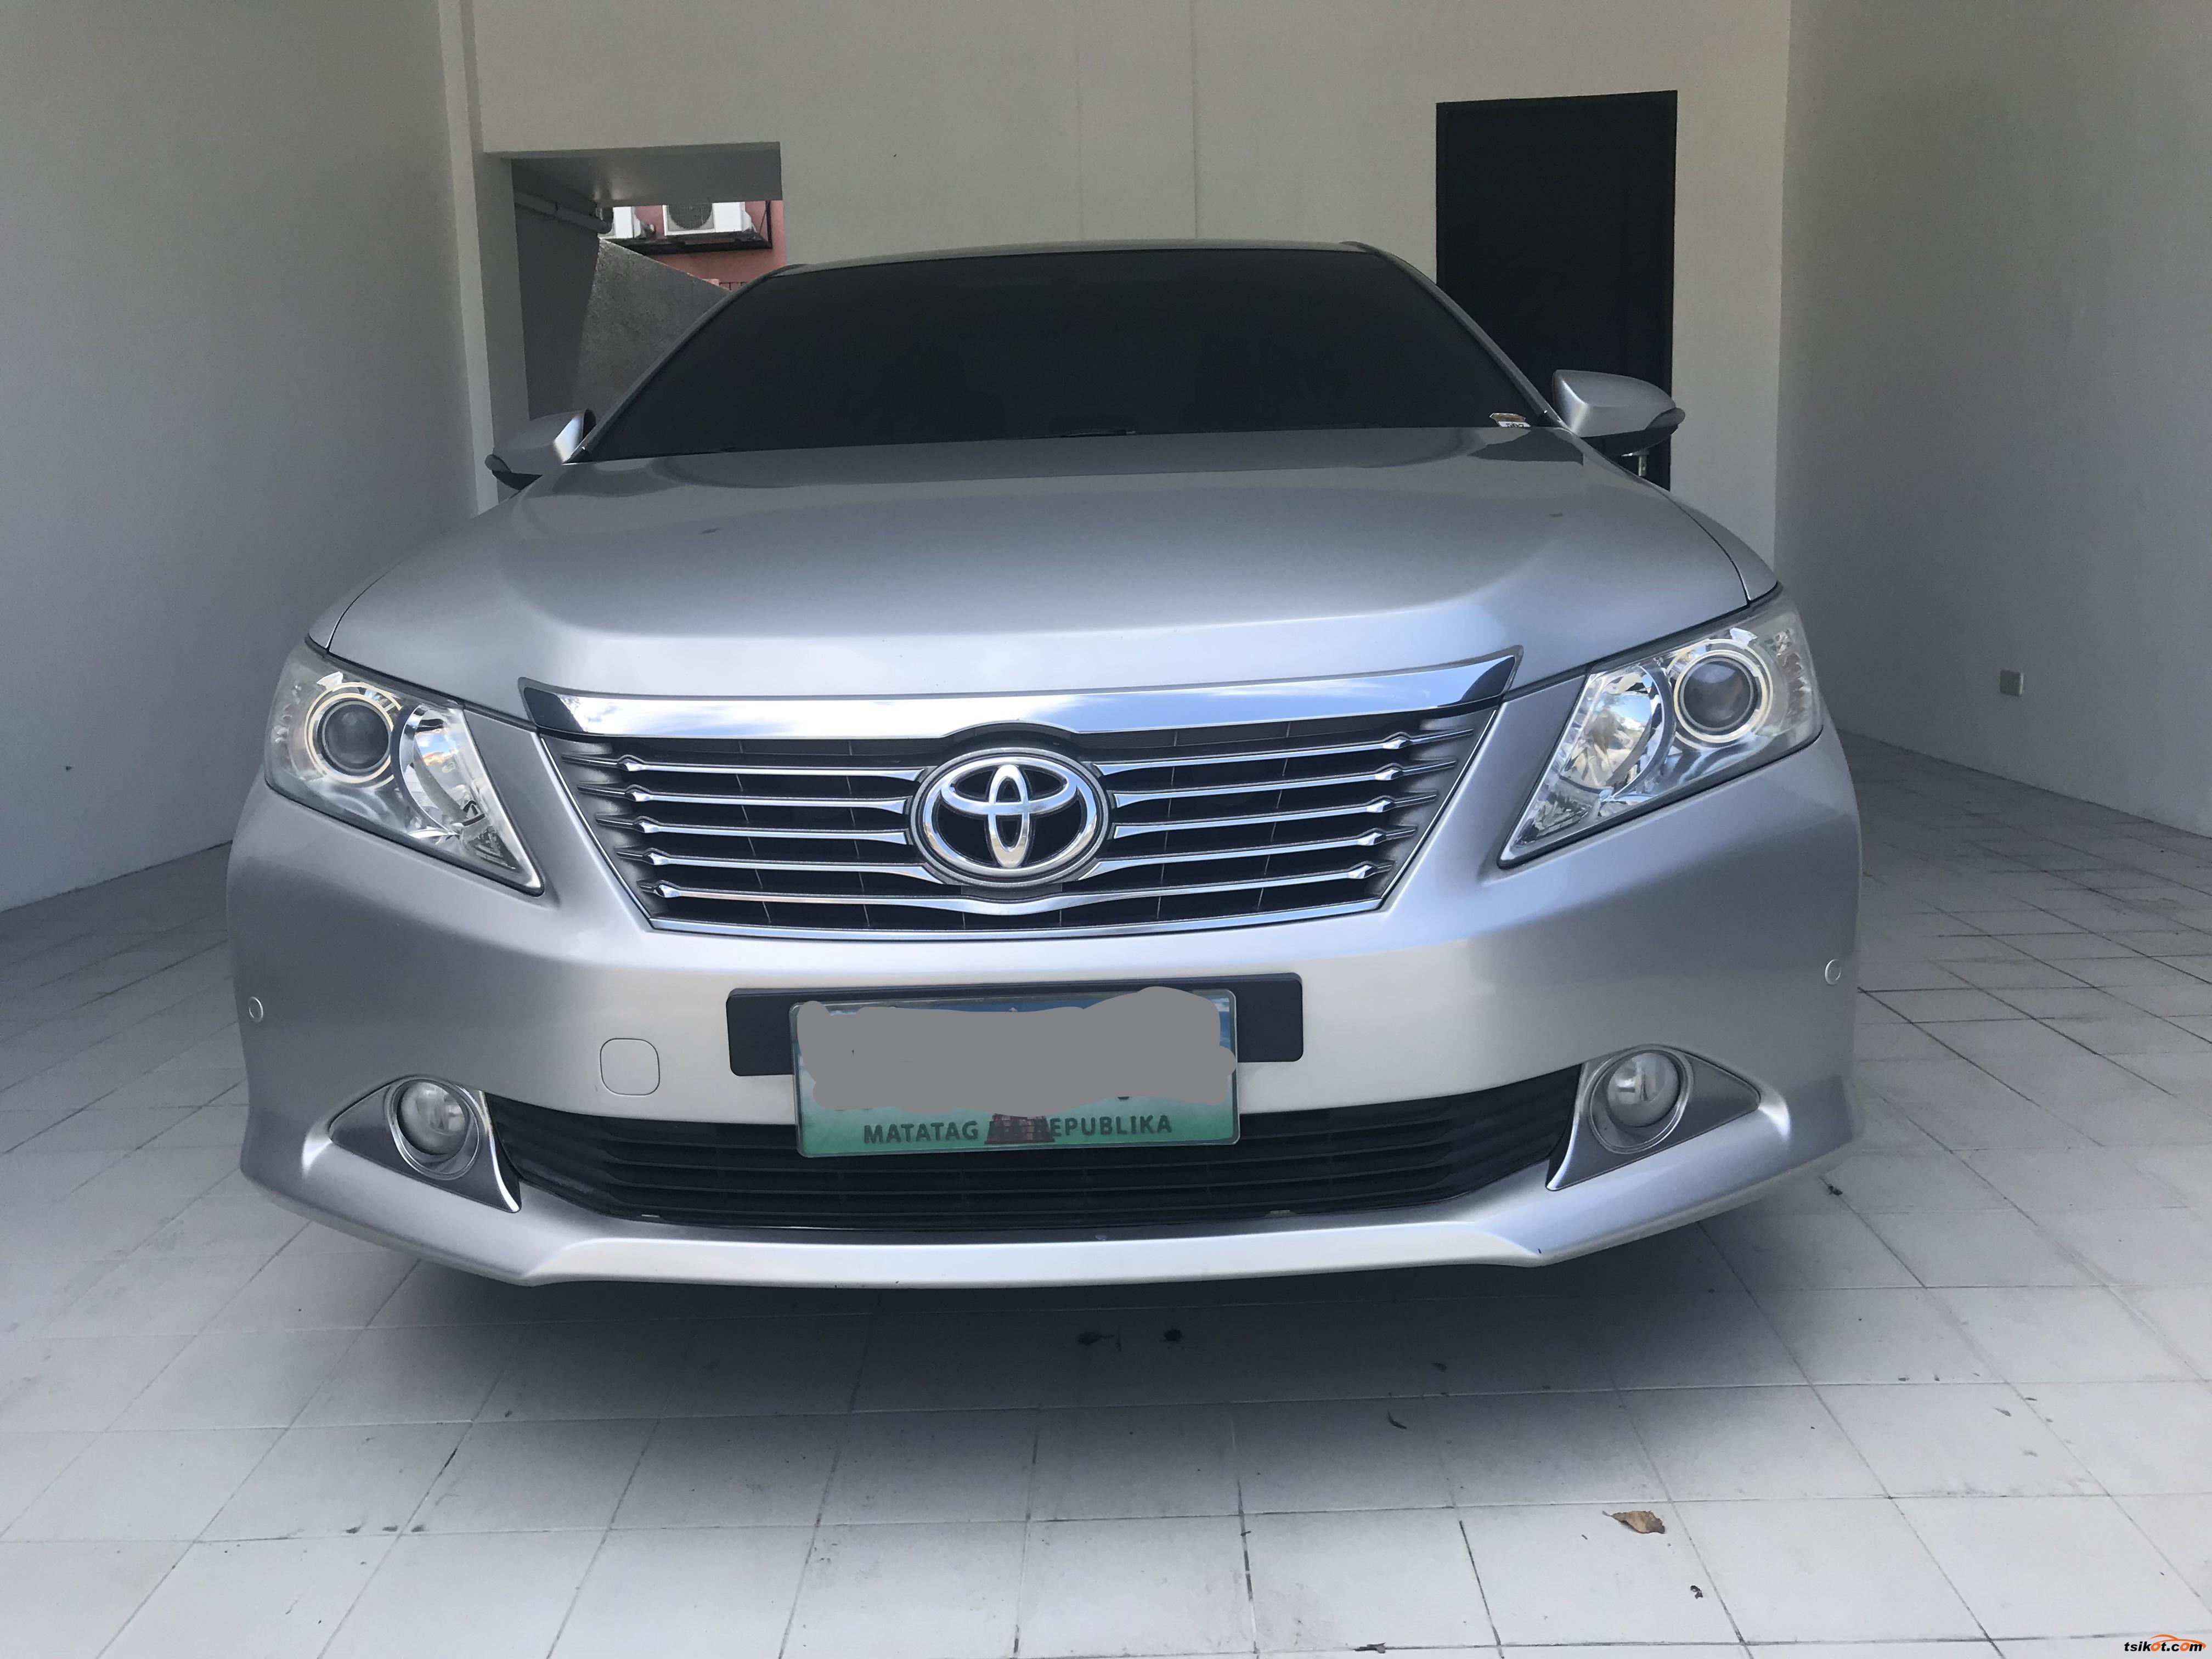 Toyota Camry 2013 - 4